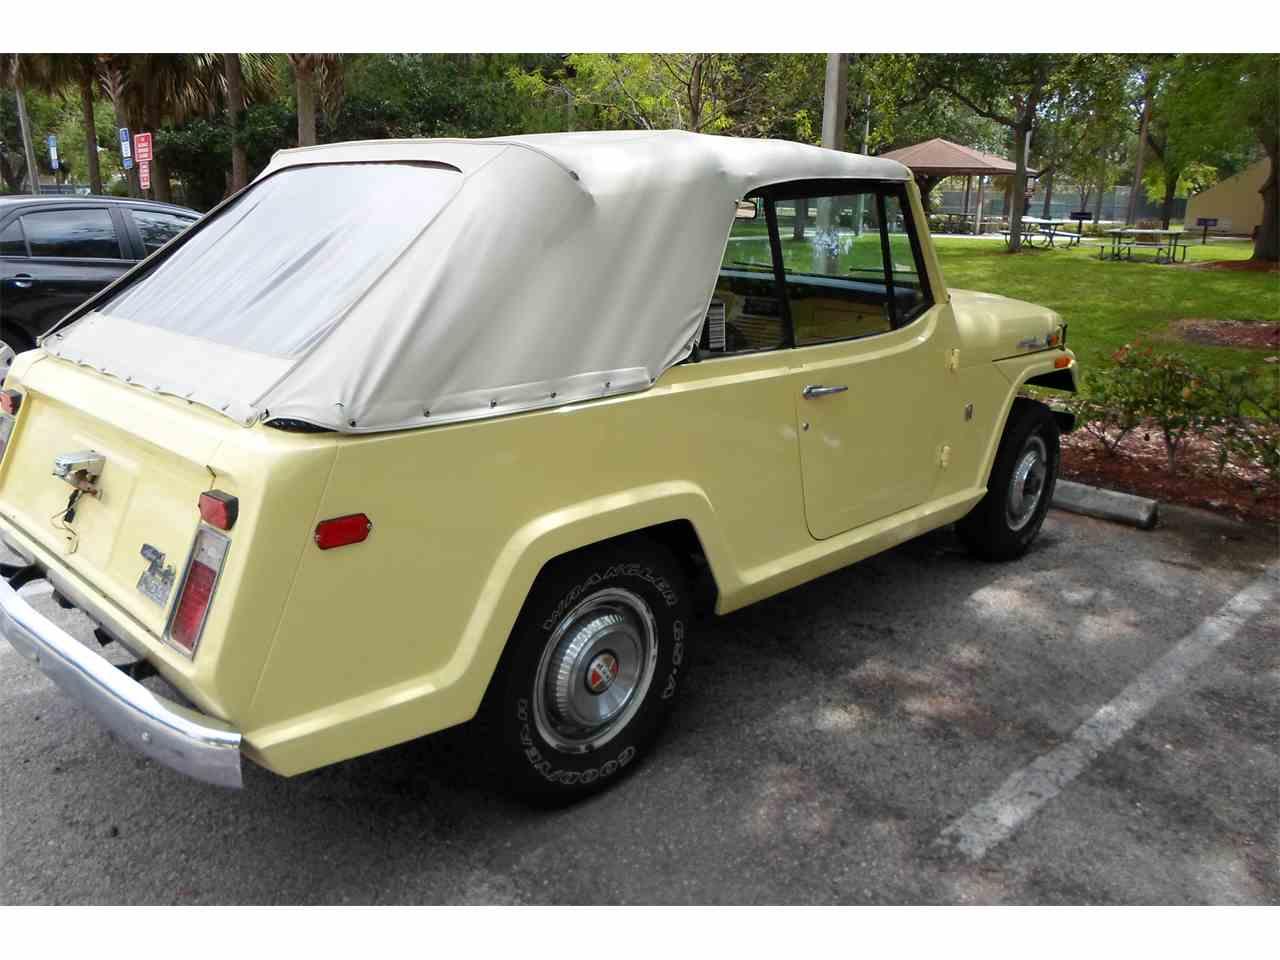 Jeep Jeepster For Sale ClassicCarscom CC - Pompano classic cars